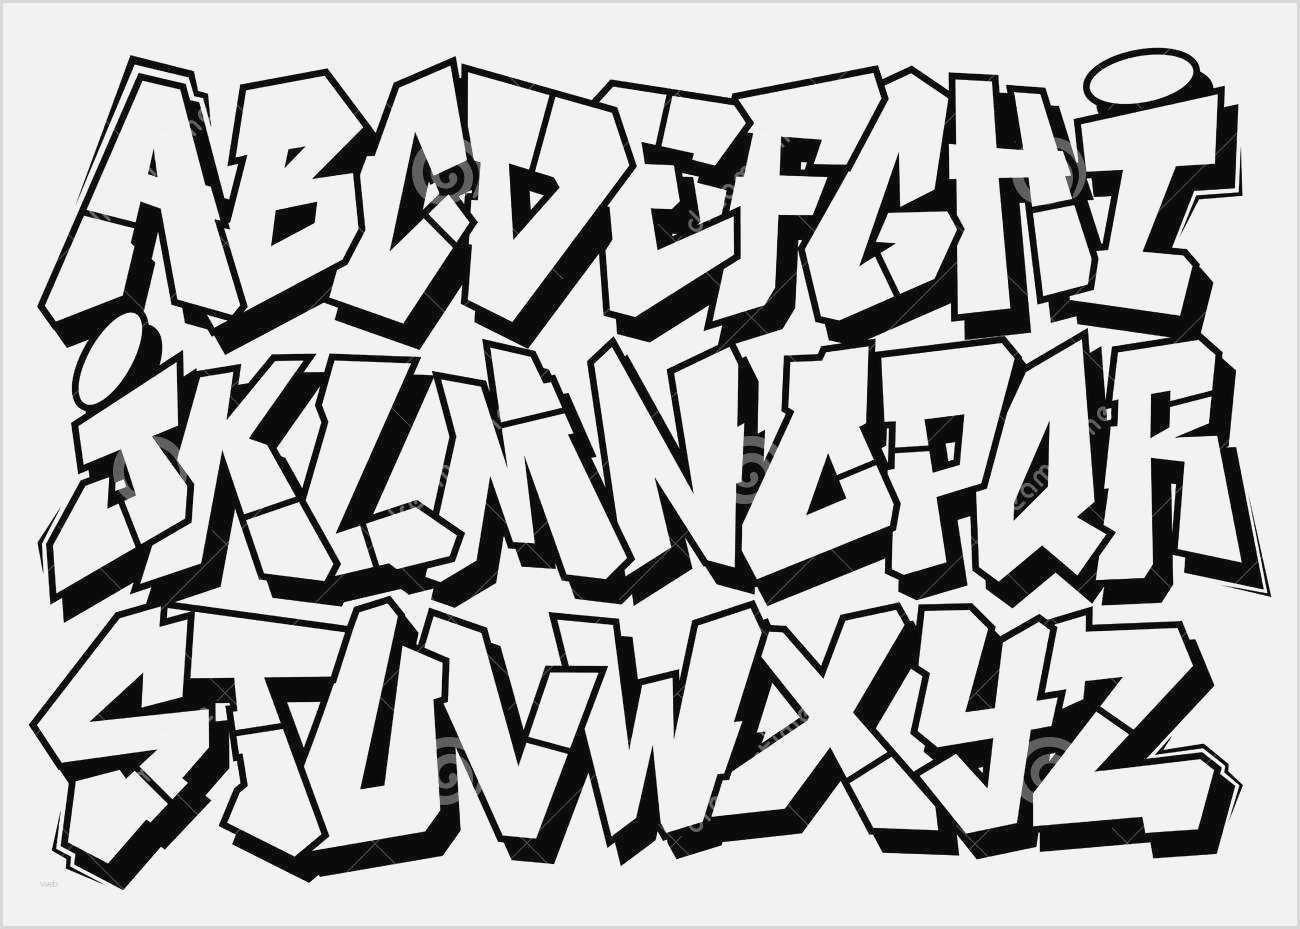 Graffiti Abc Vorlagen Graffiti Alphabet Cool